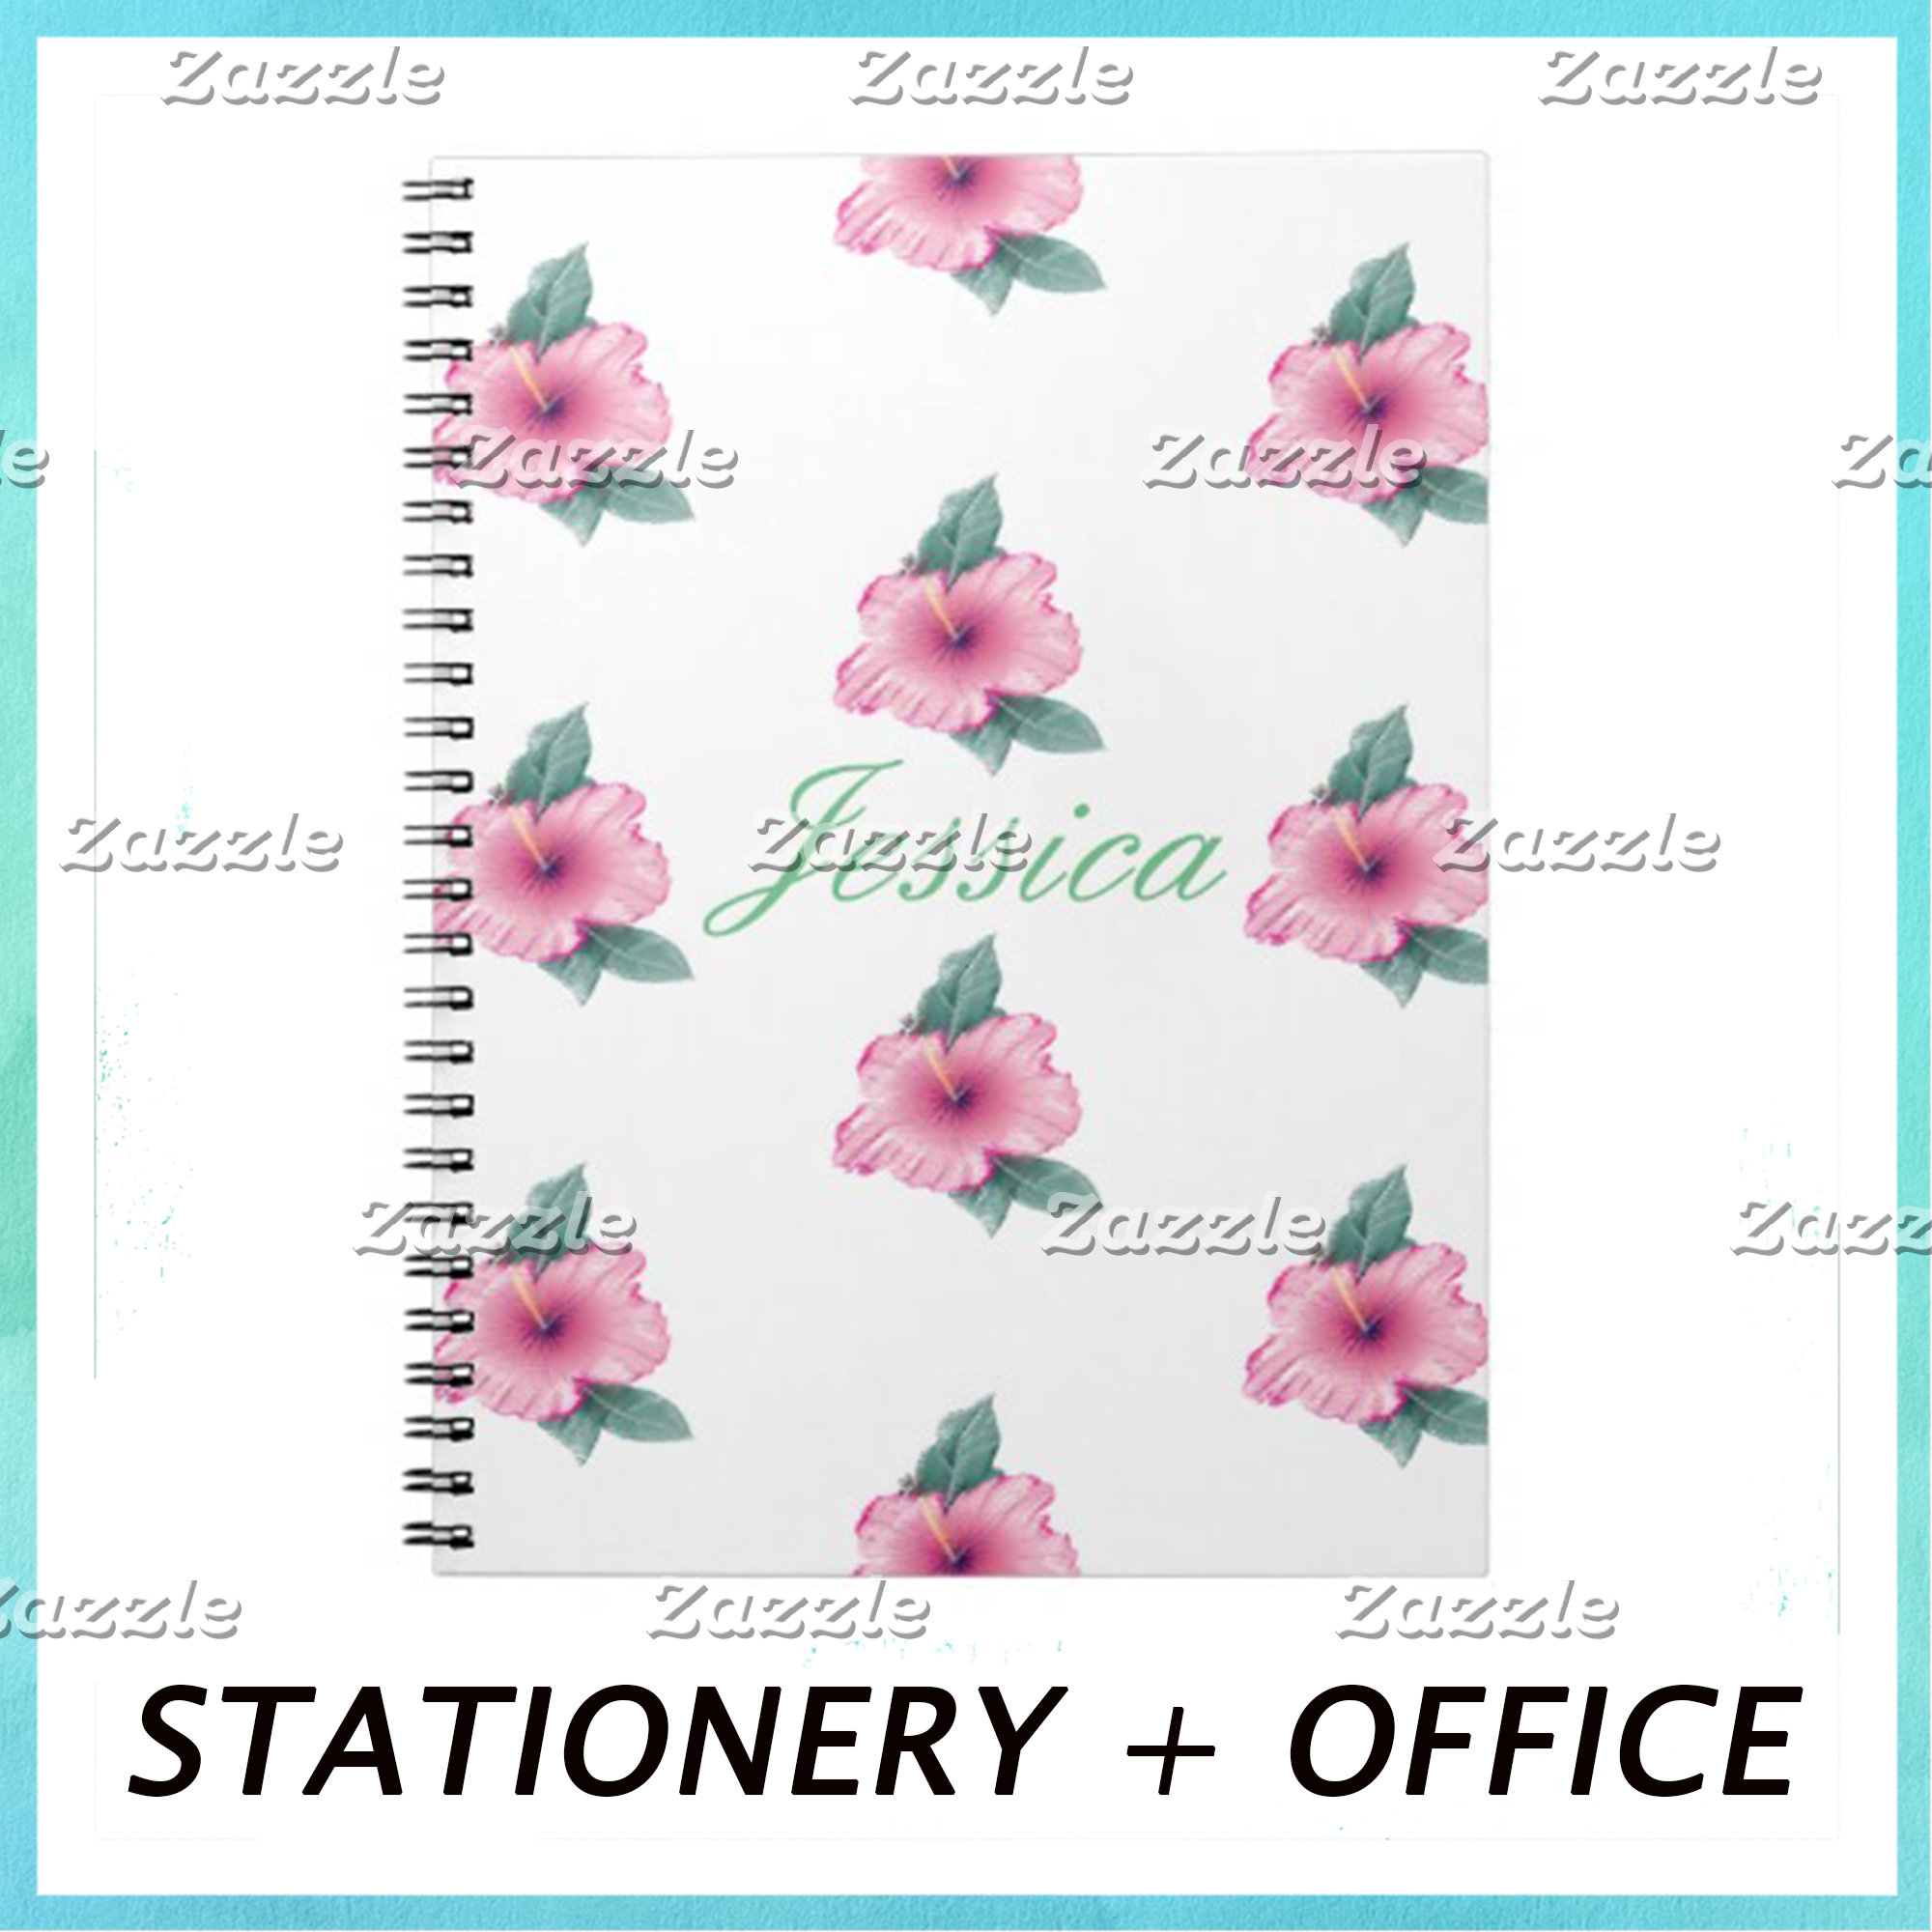 Stationery + Office